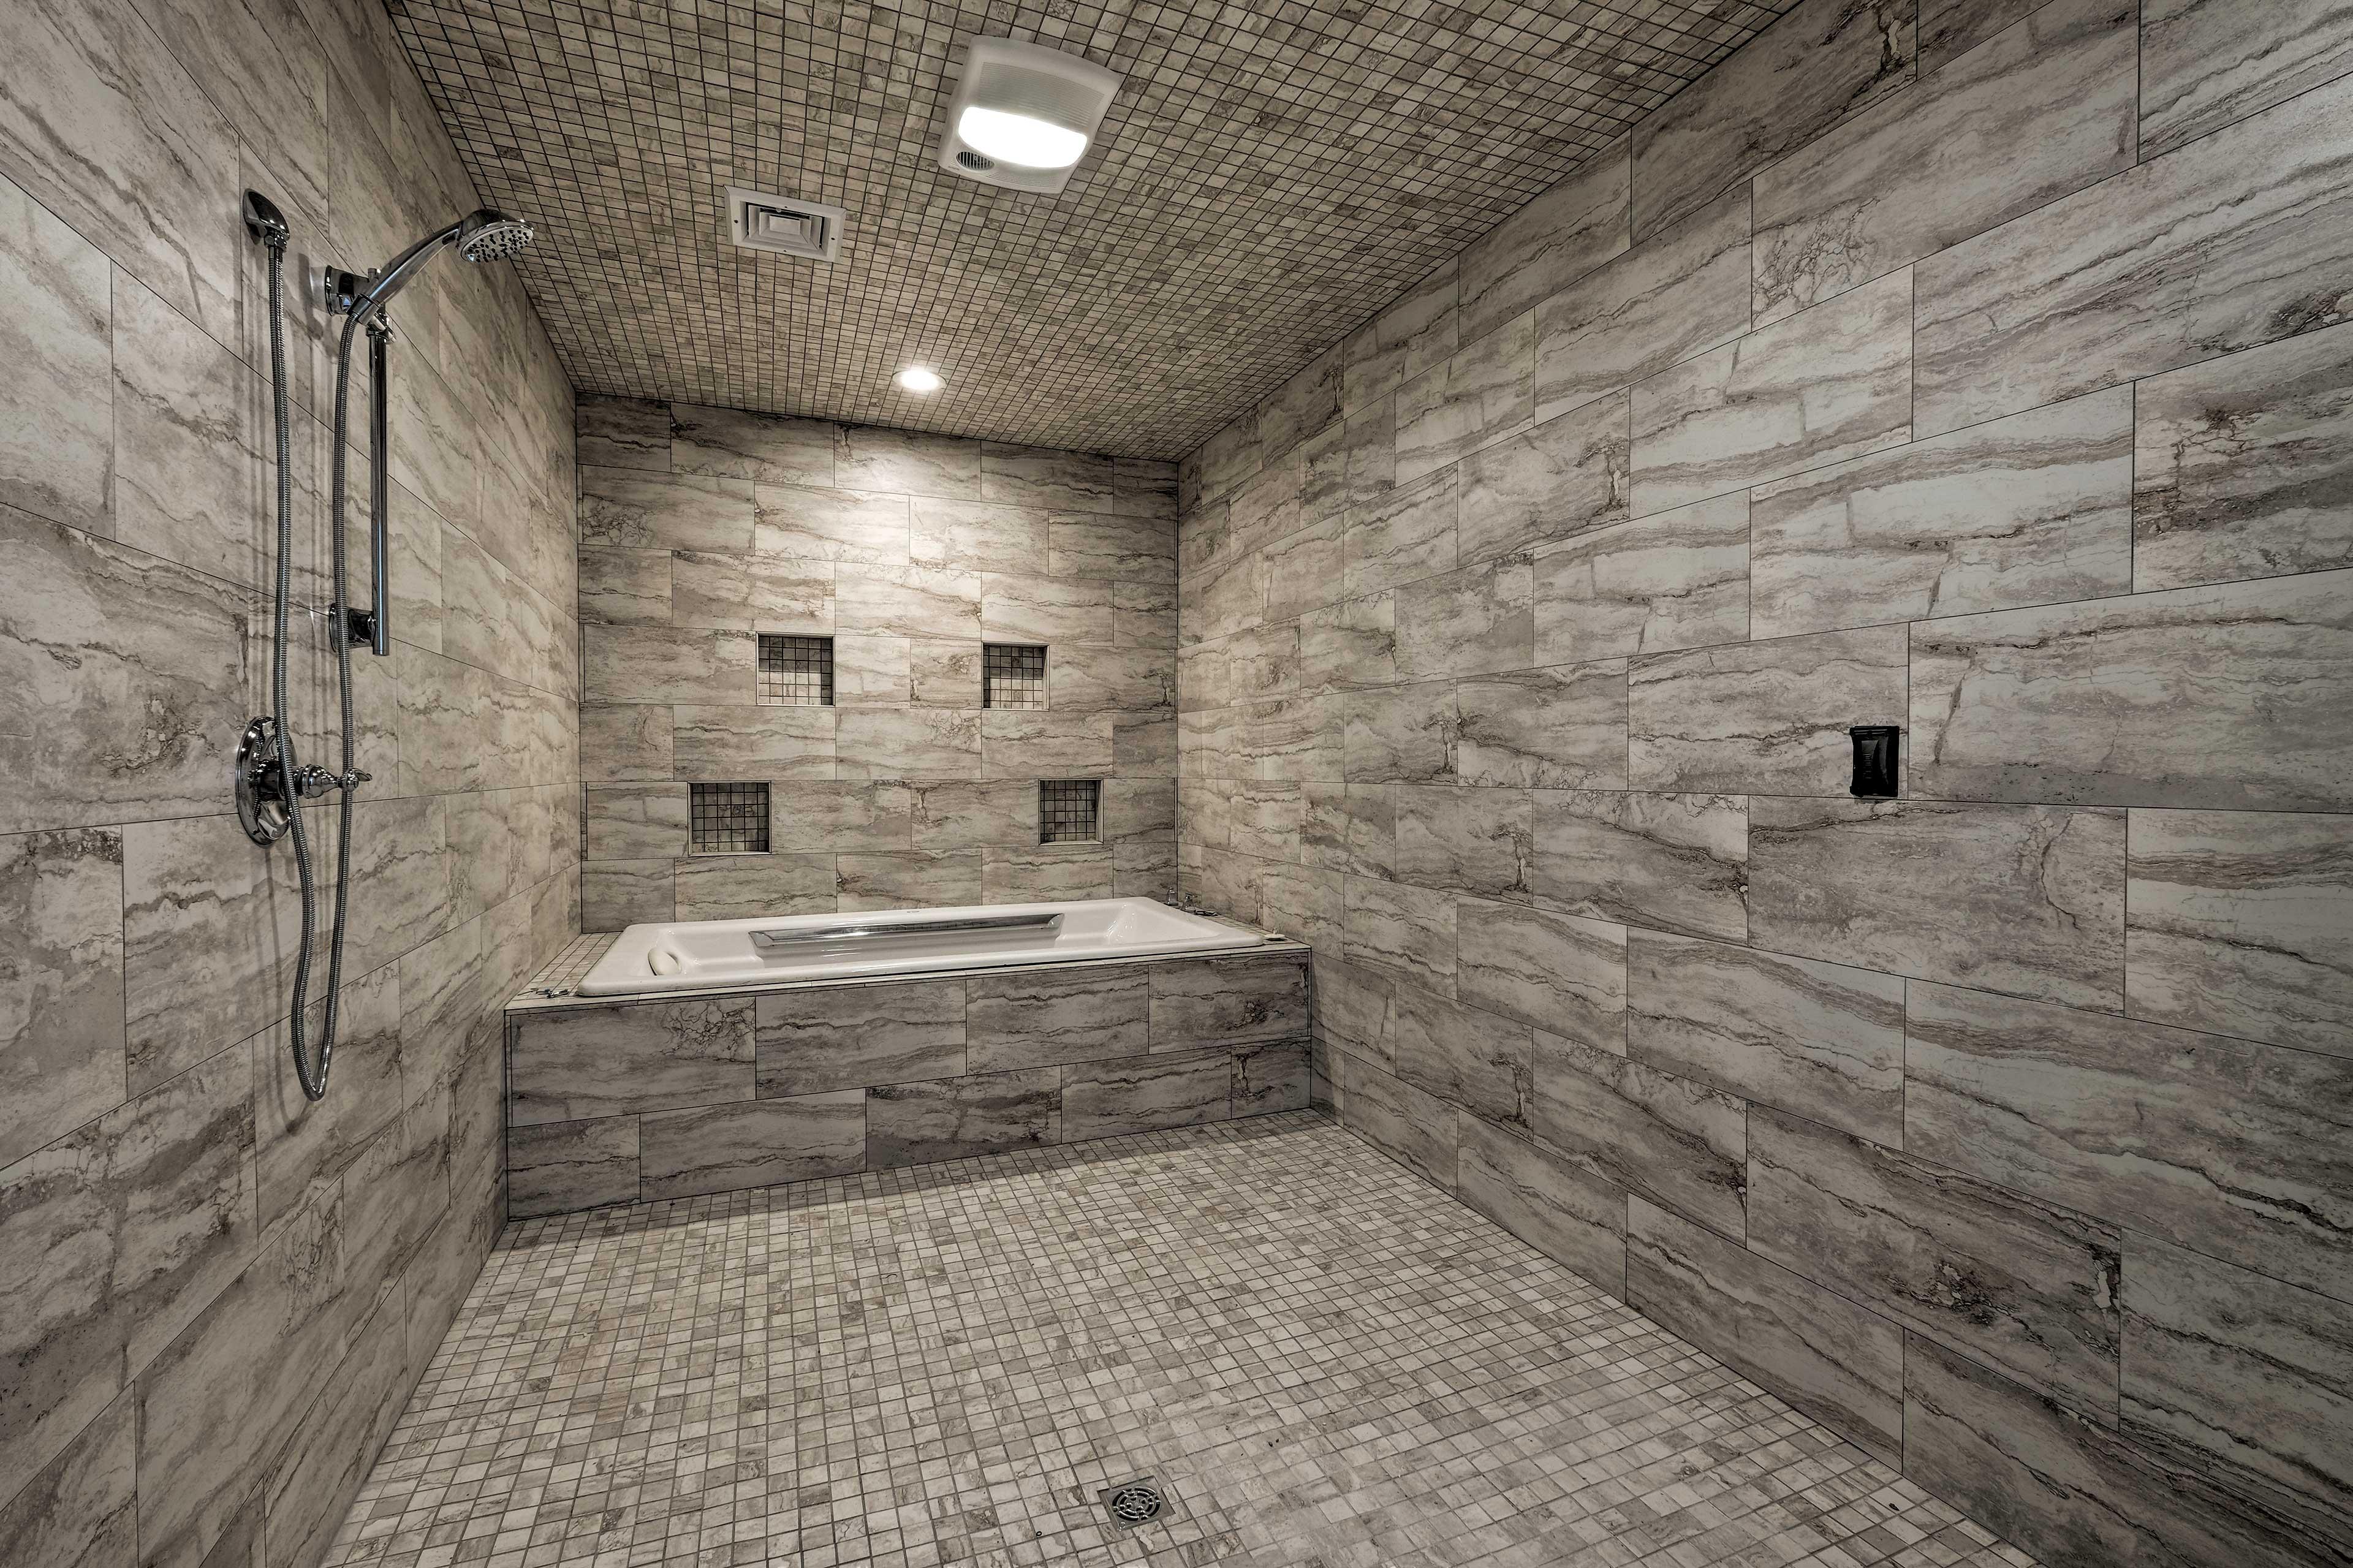 Bathroom 1: shower head, bathtub